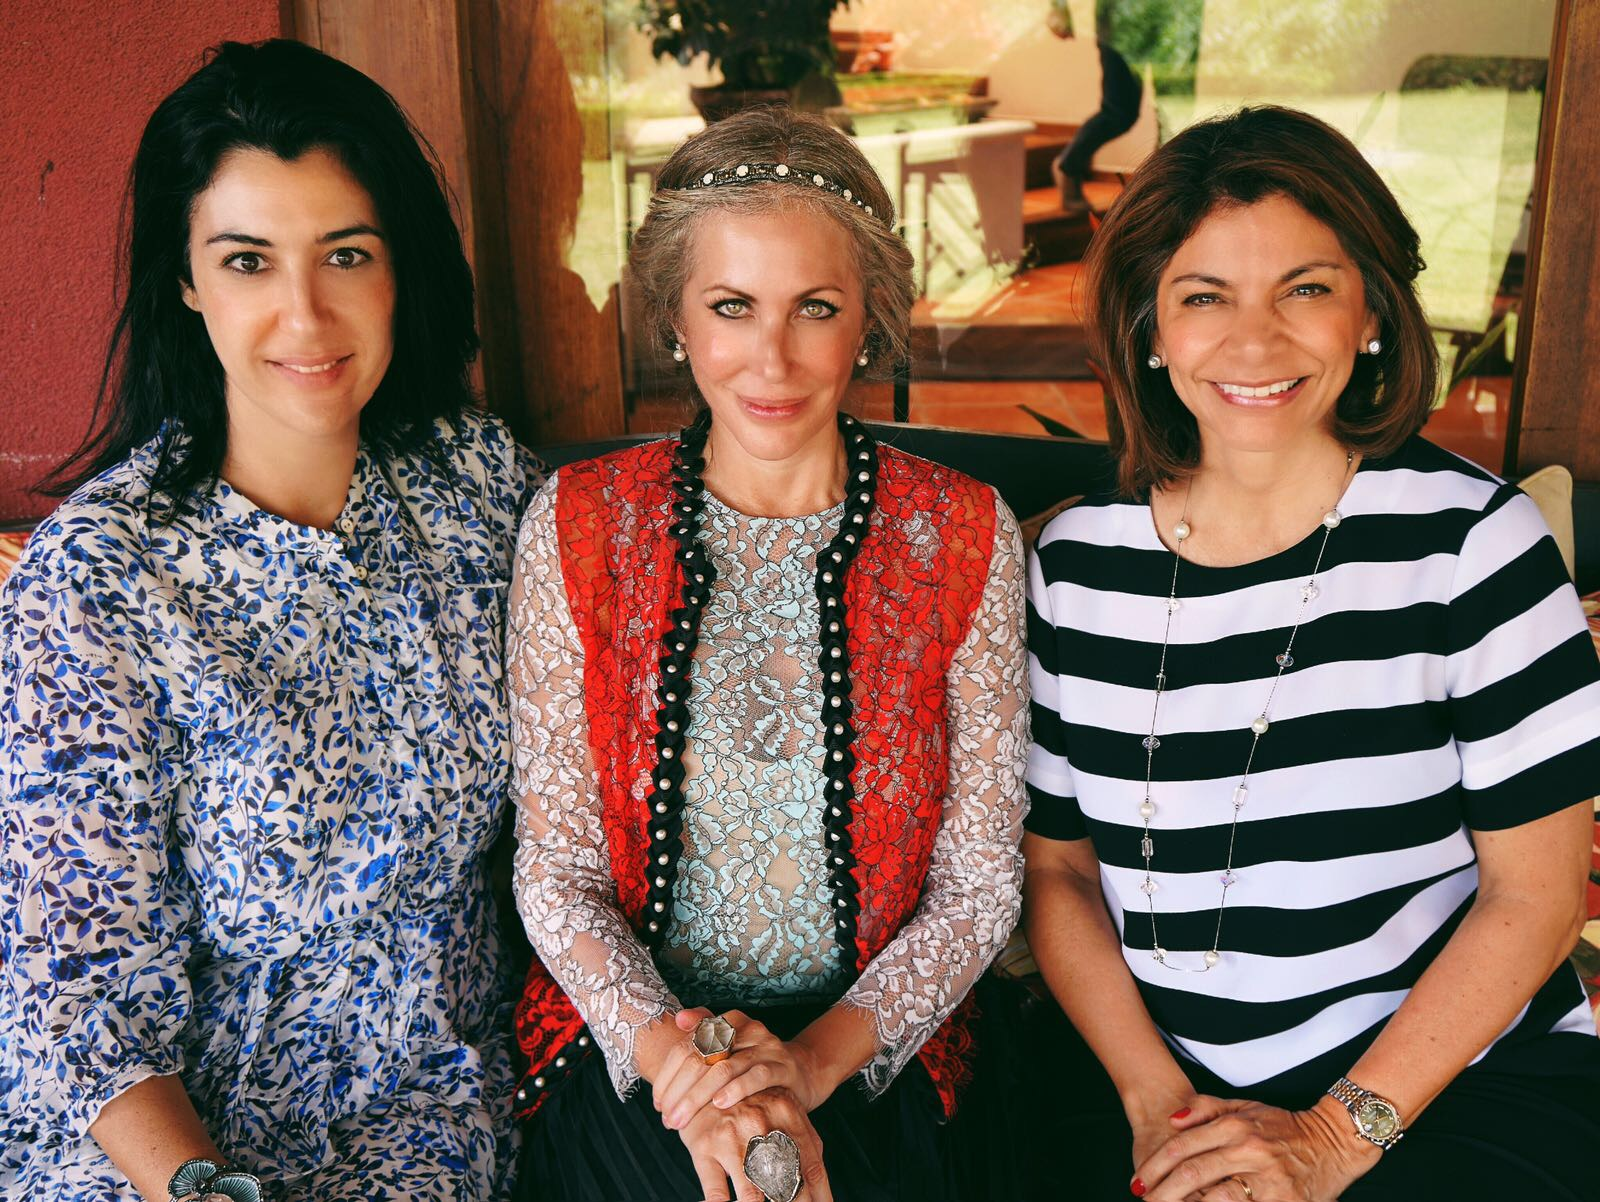 Carmen pictured with Costa Rica Fashion Summit CEO and founder Andrea Somma-Trejos and former Costa Rican president Laura Chinchilla Miranda.